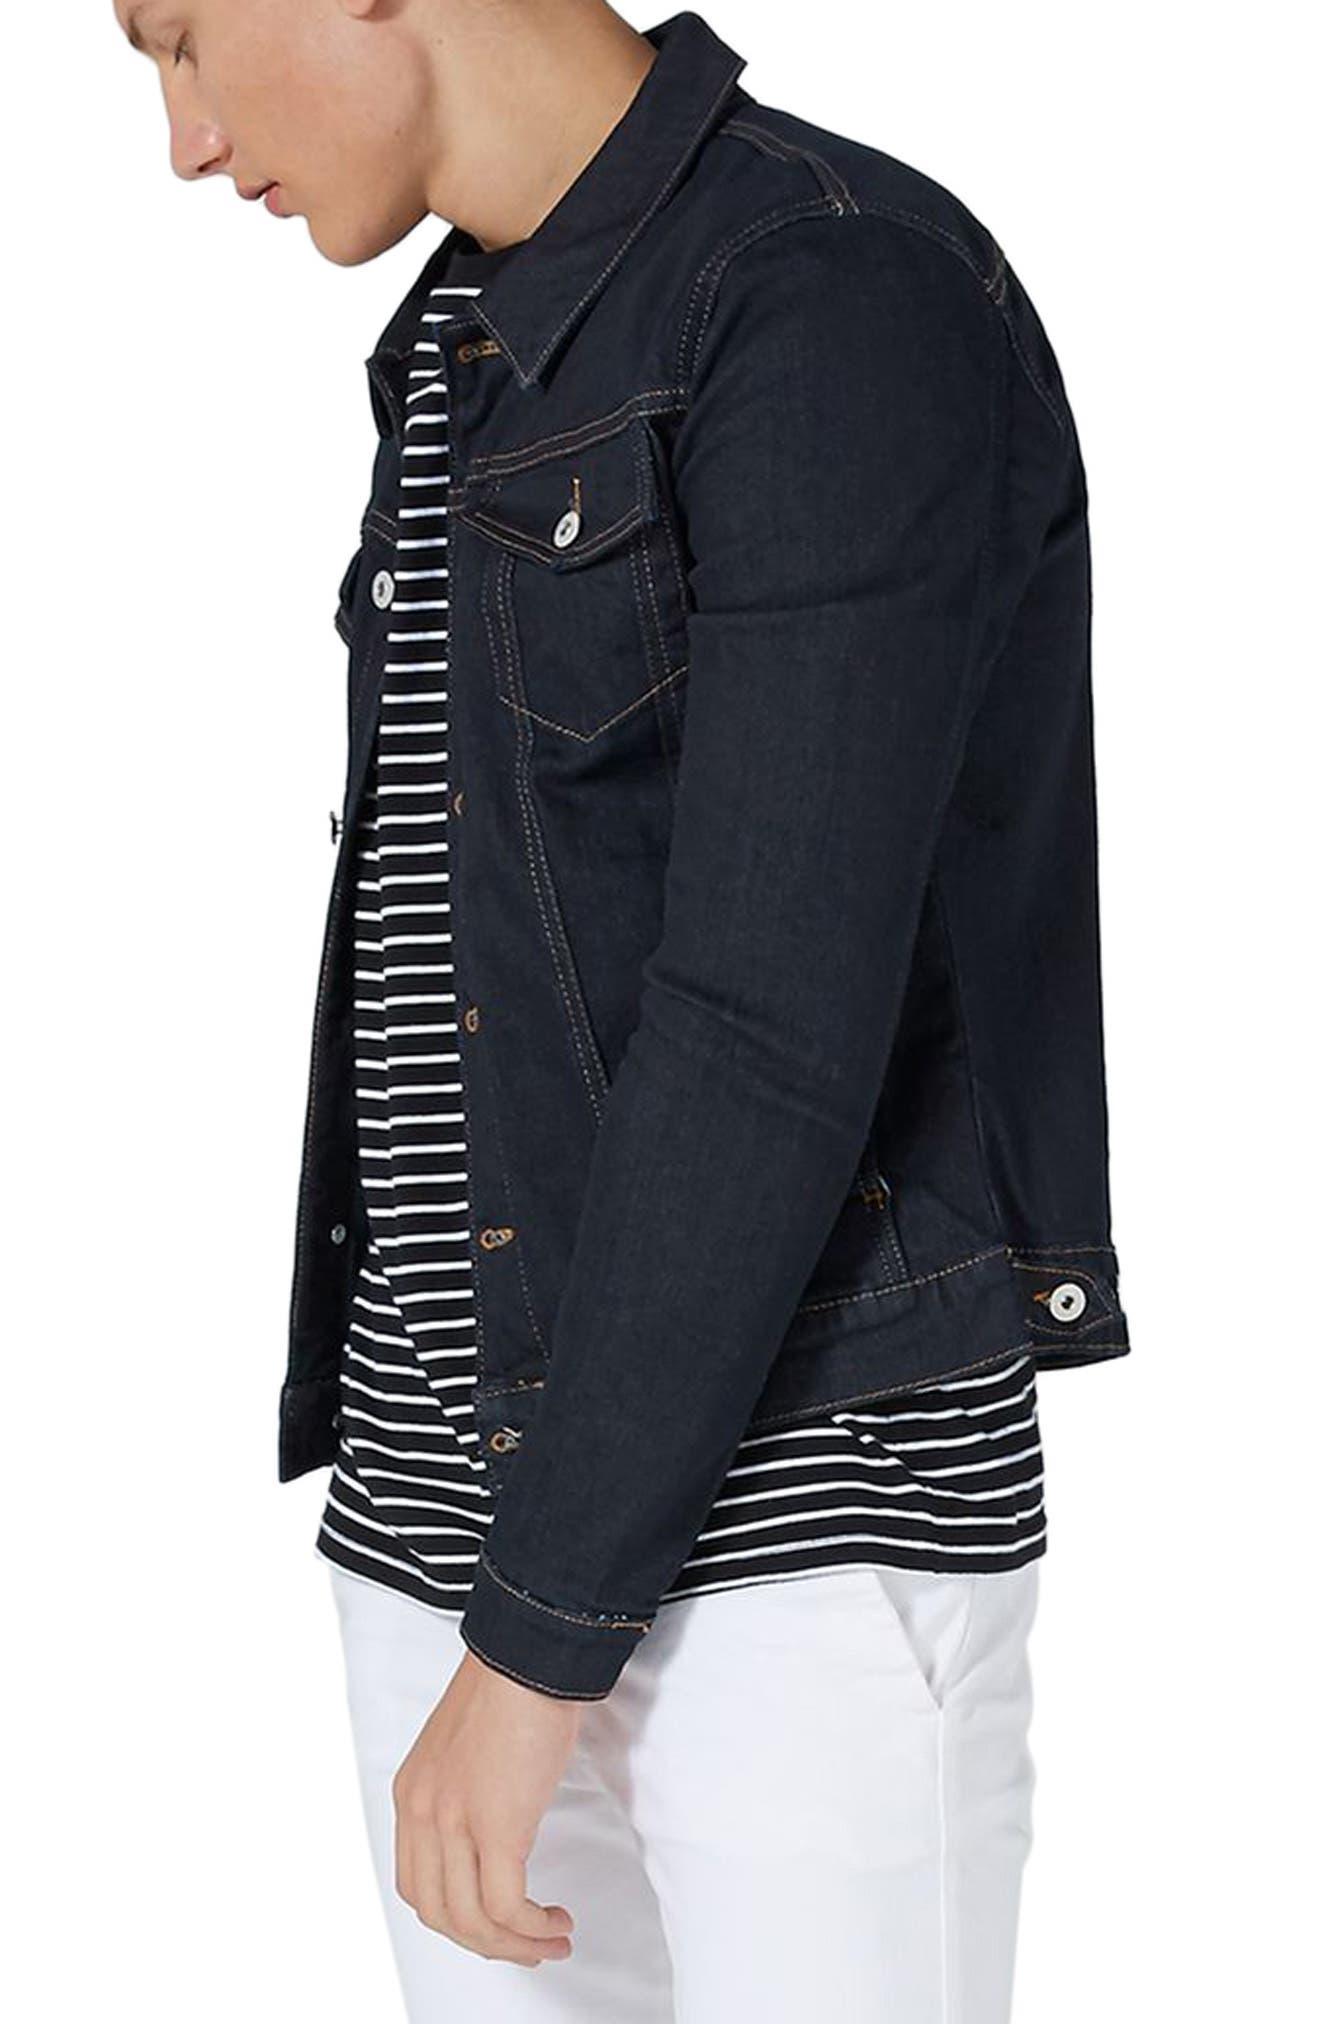 Alternate Image 1 Selected - Topman Raw Muscle Fit Denim Jacket